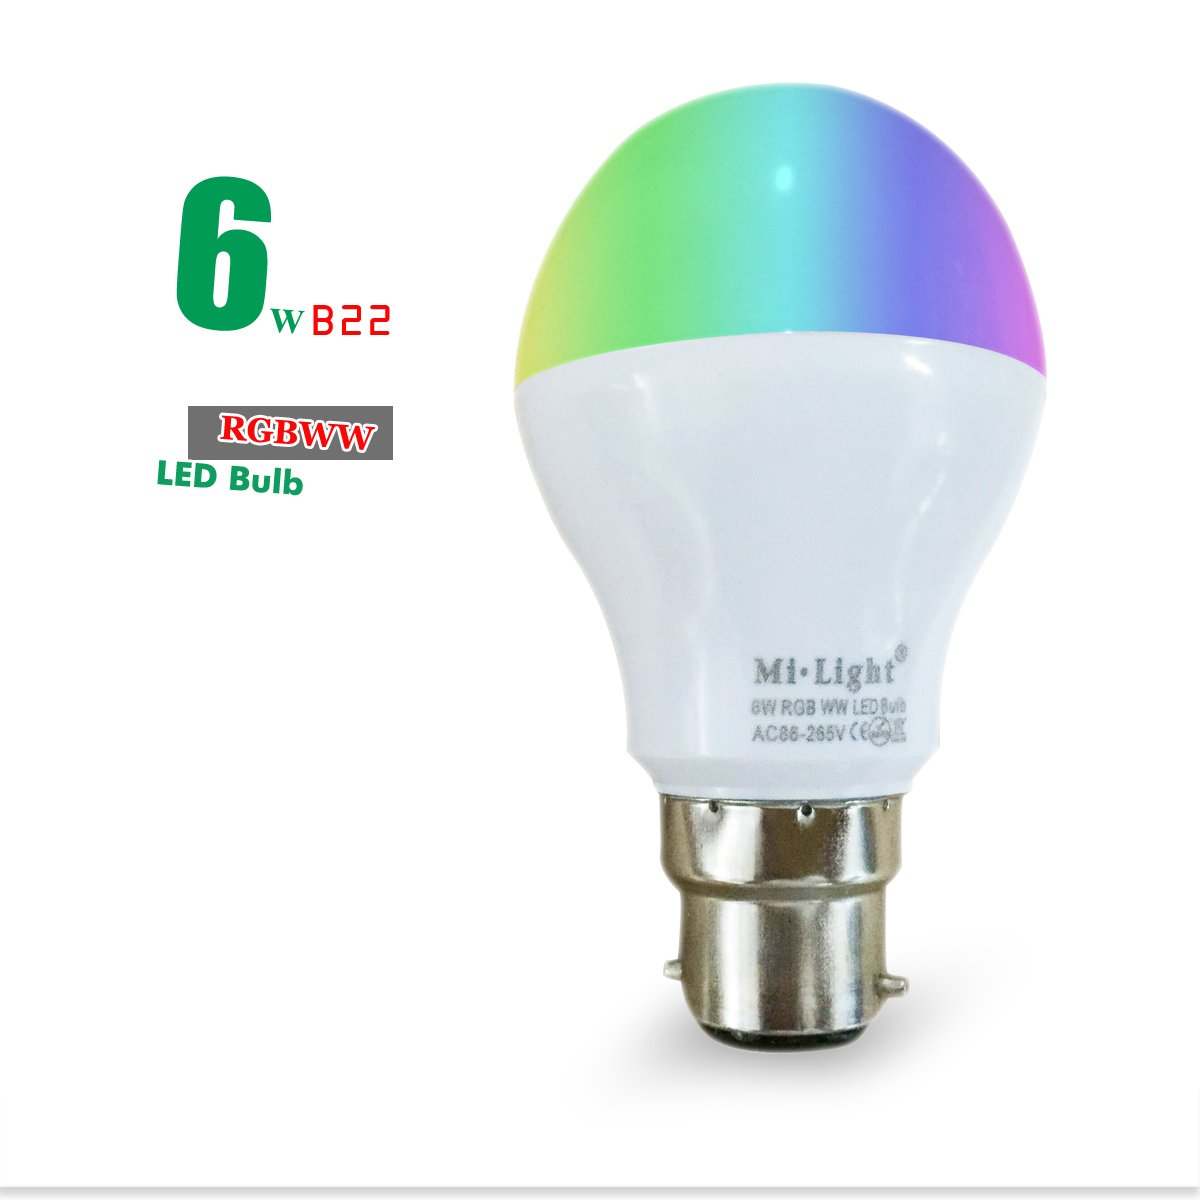 mi-light調光機能付きLED電球RGB + CCT LEDスポットライトスマートLEDランプ 6W E22 RGBWW B01LAZLVTW 15029   6W E22 RGBWW